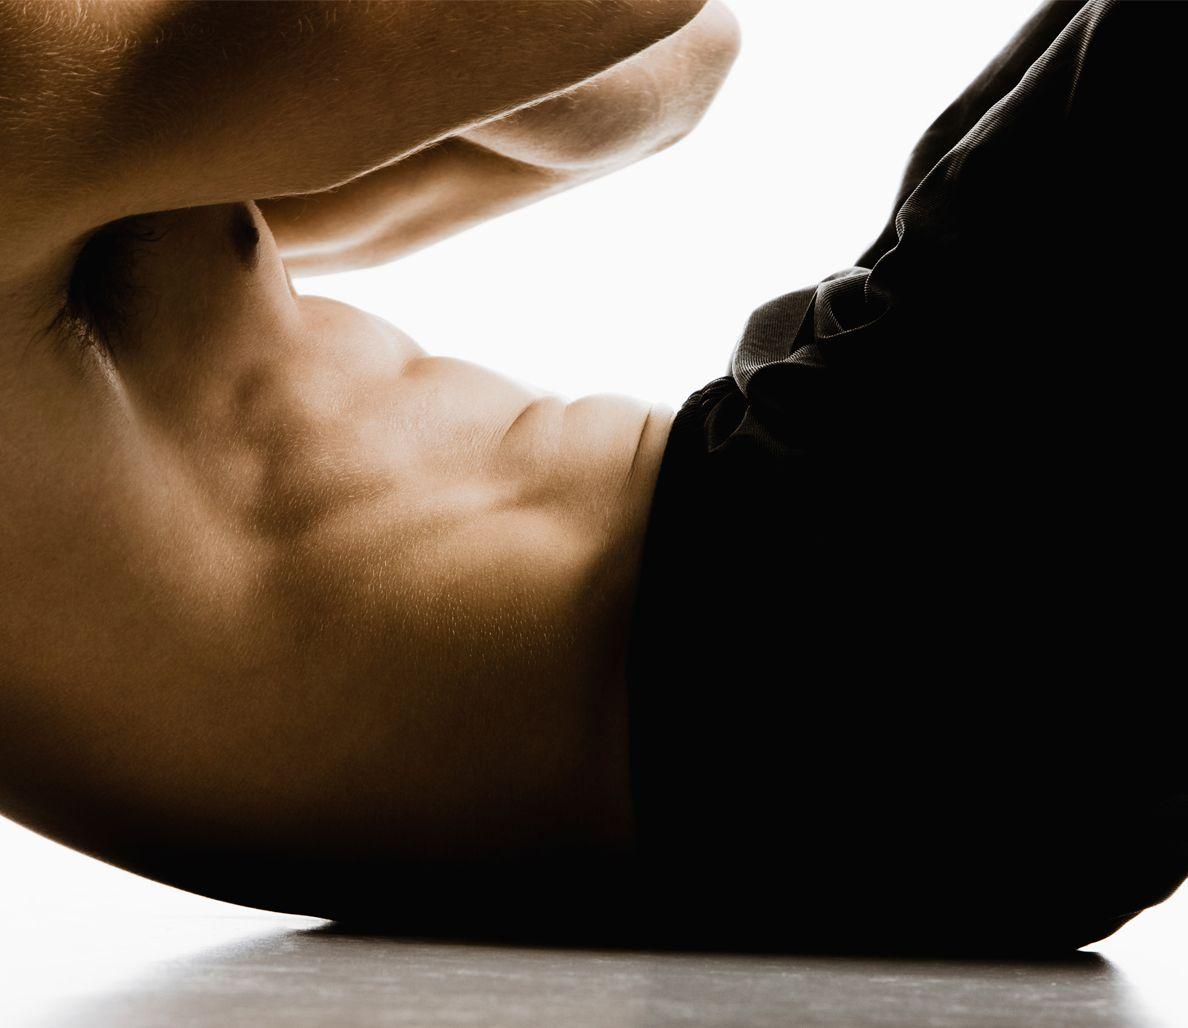 victorias secret angels diet workout plan